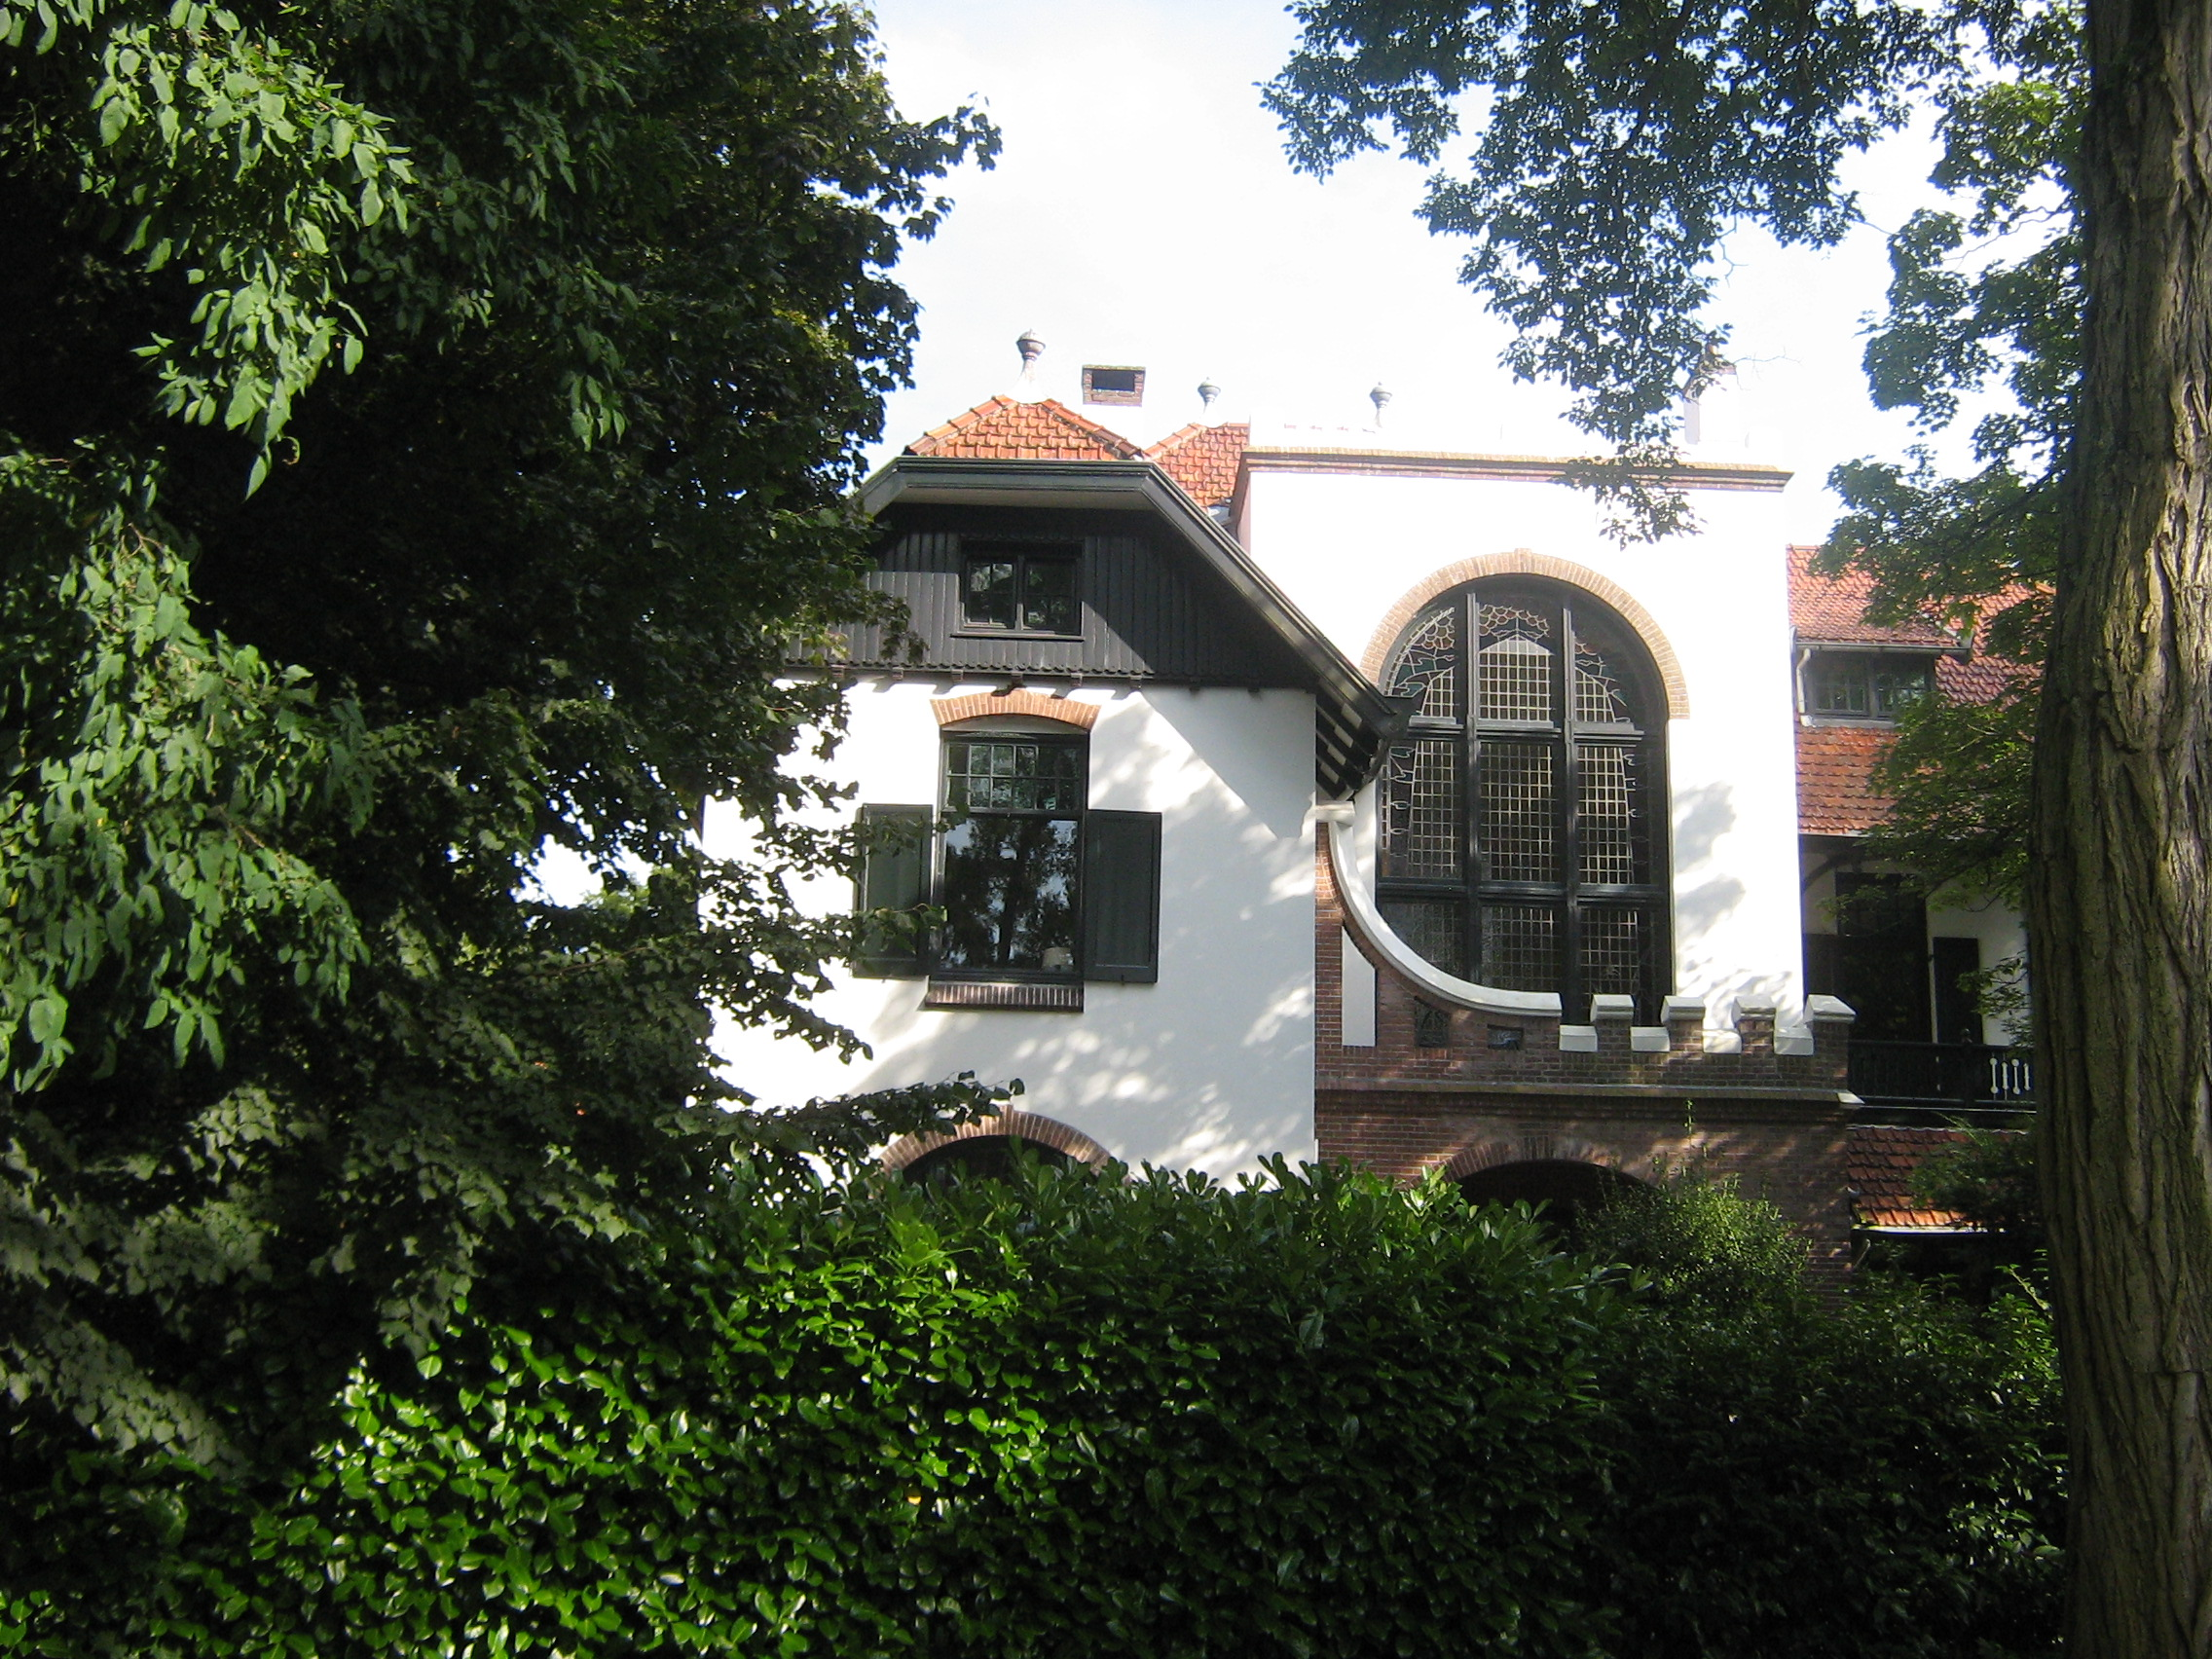 Villa, gebouwd in art nouveau stijl met chalet-stijl elementen in ...